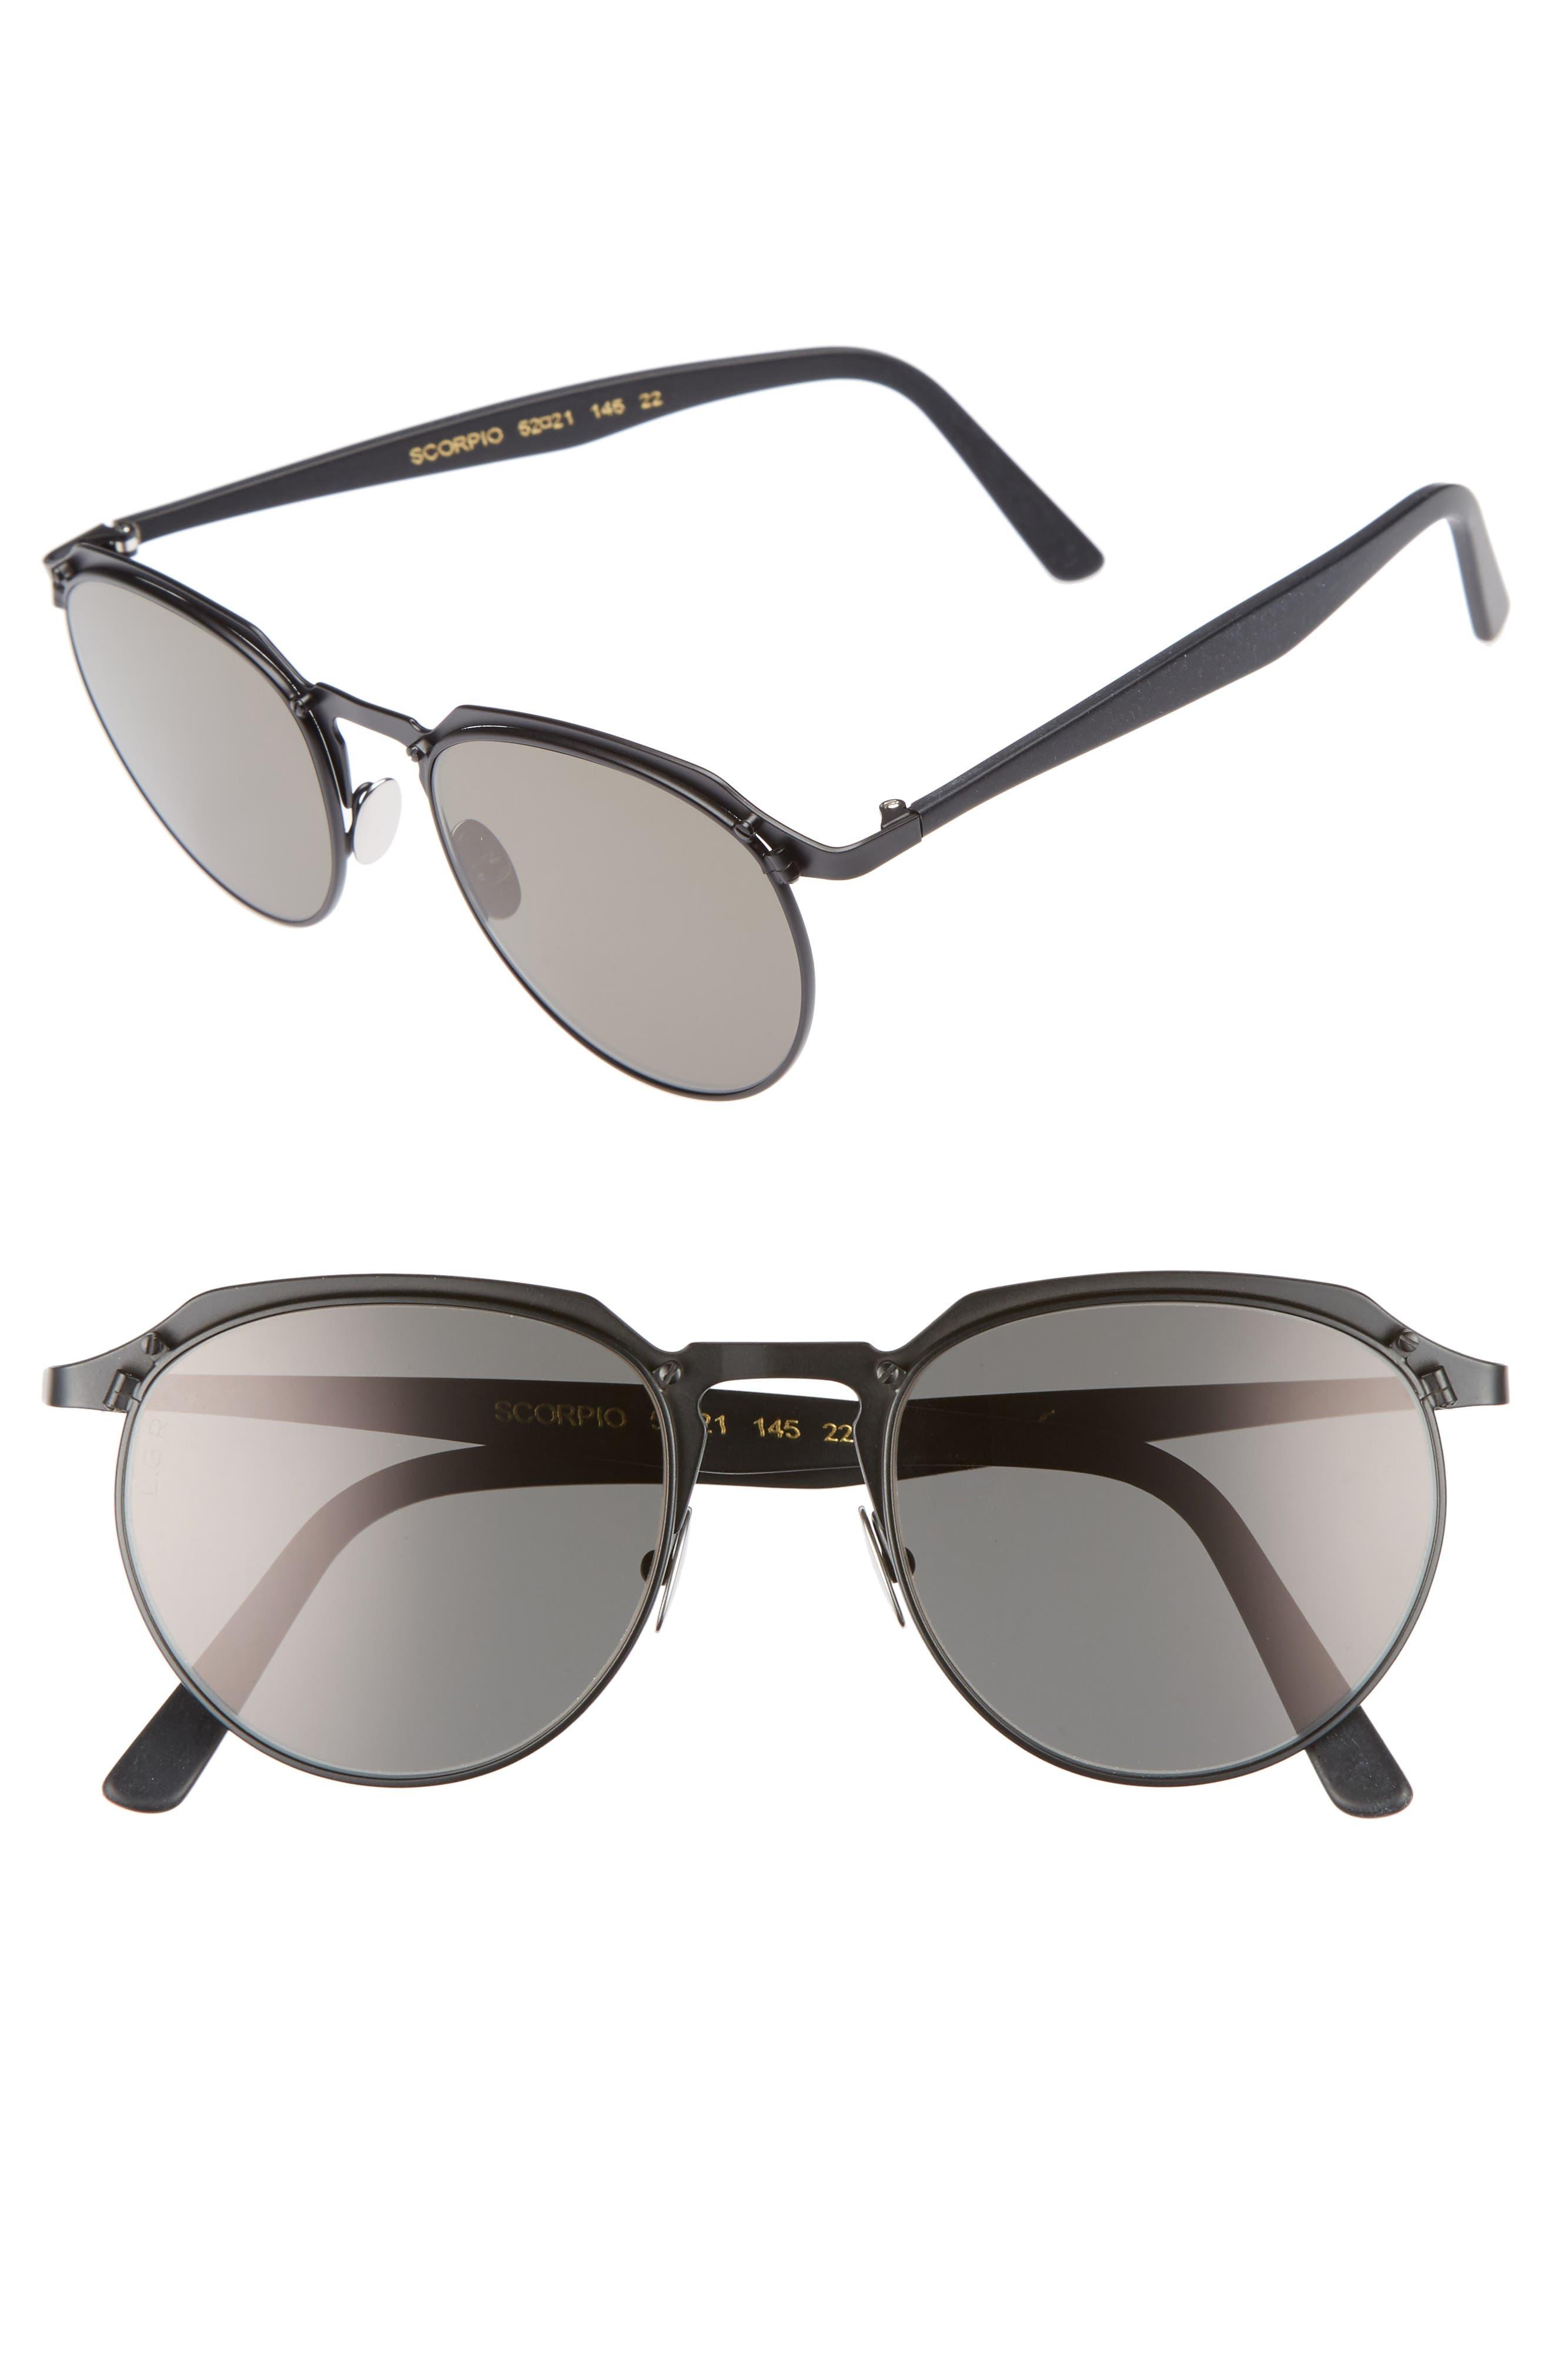 Main Image - L.G.R Scorpio 52mm Sunglasses